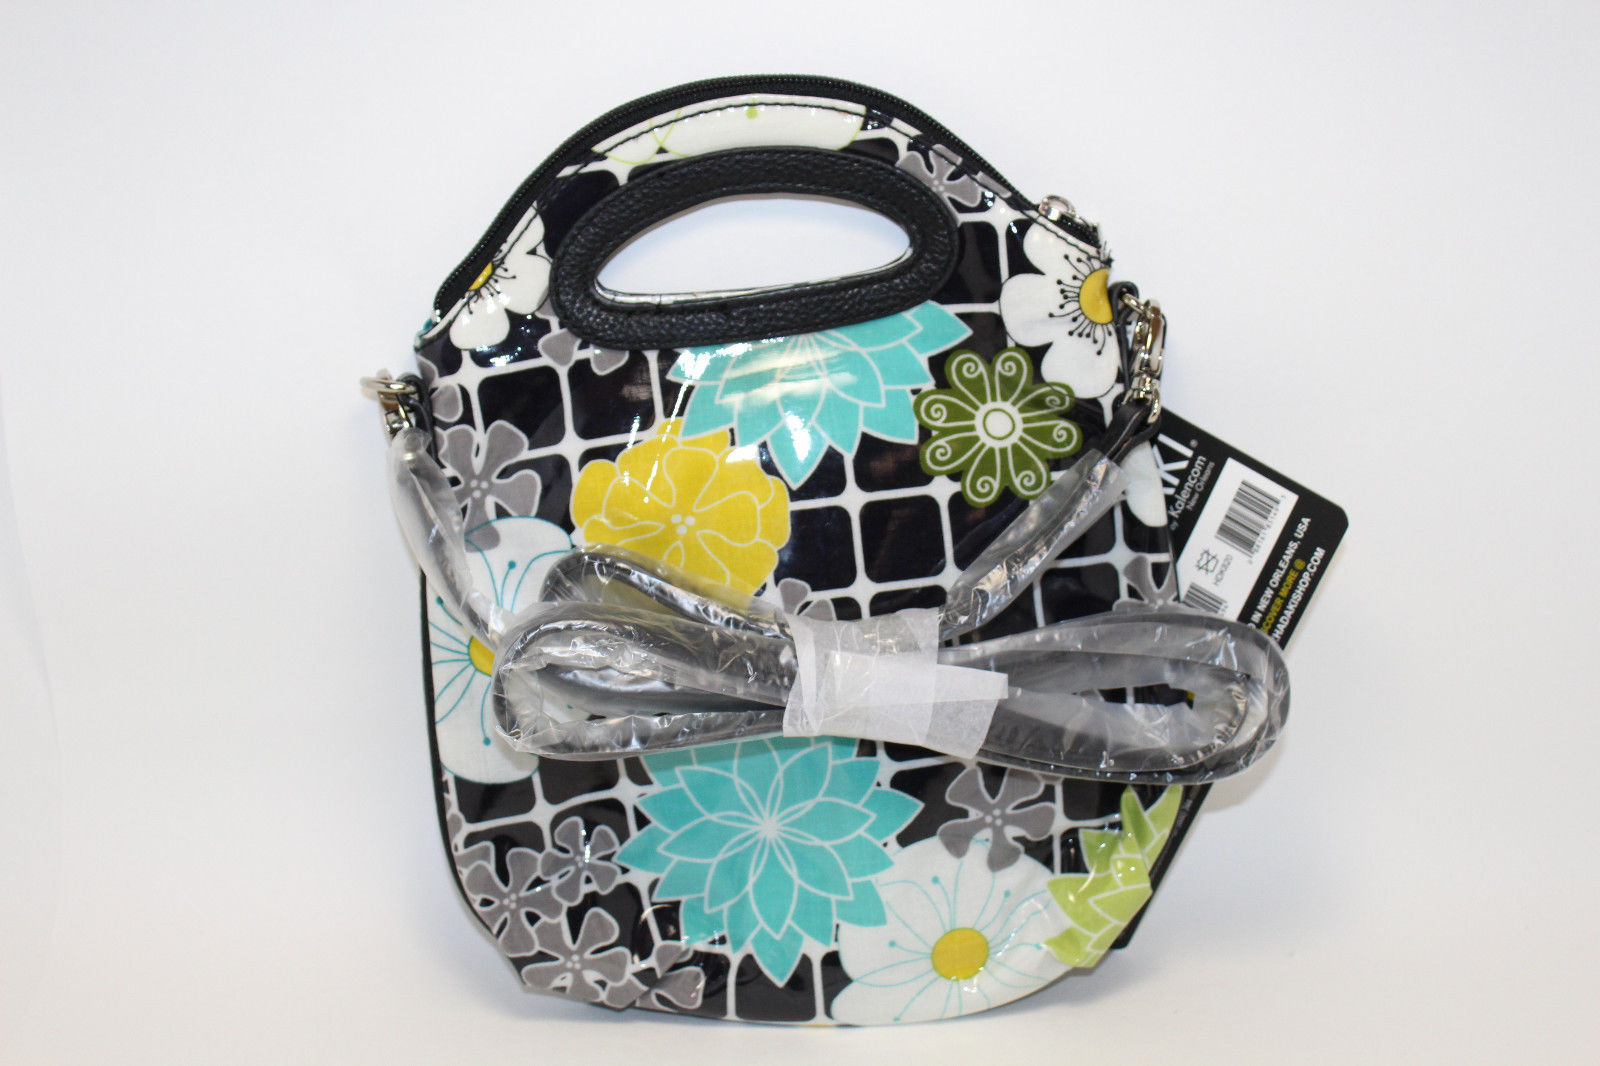 Hadaki by Kalencom New Orleans Sling - Clutch - O'Floral Tote Diaper Bag